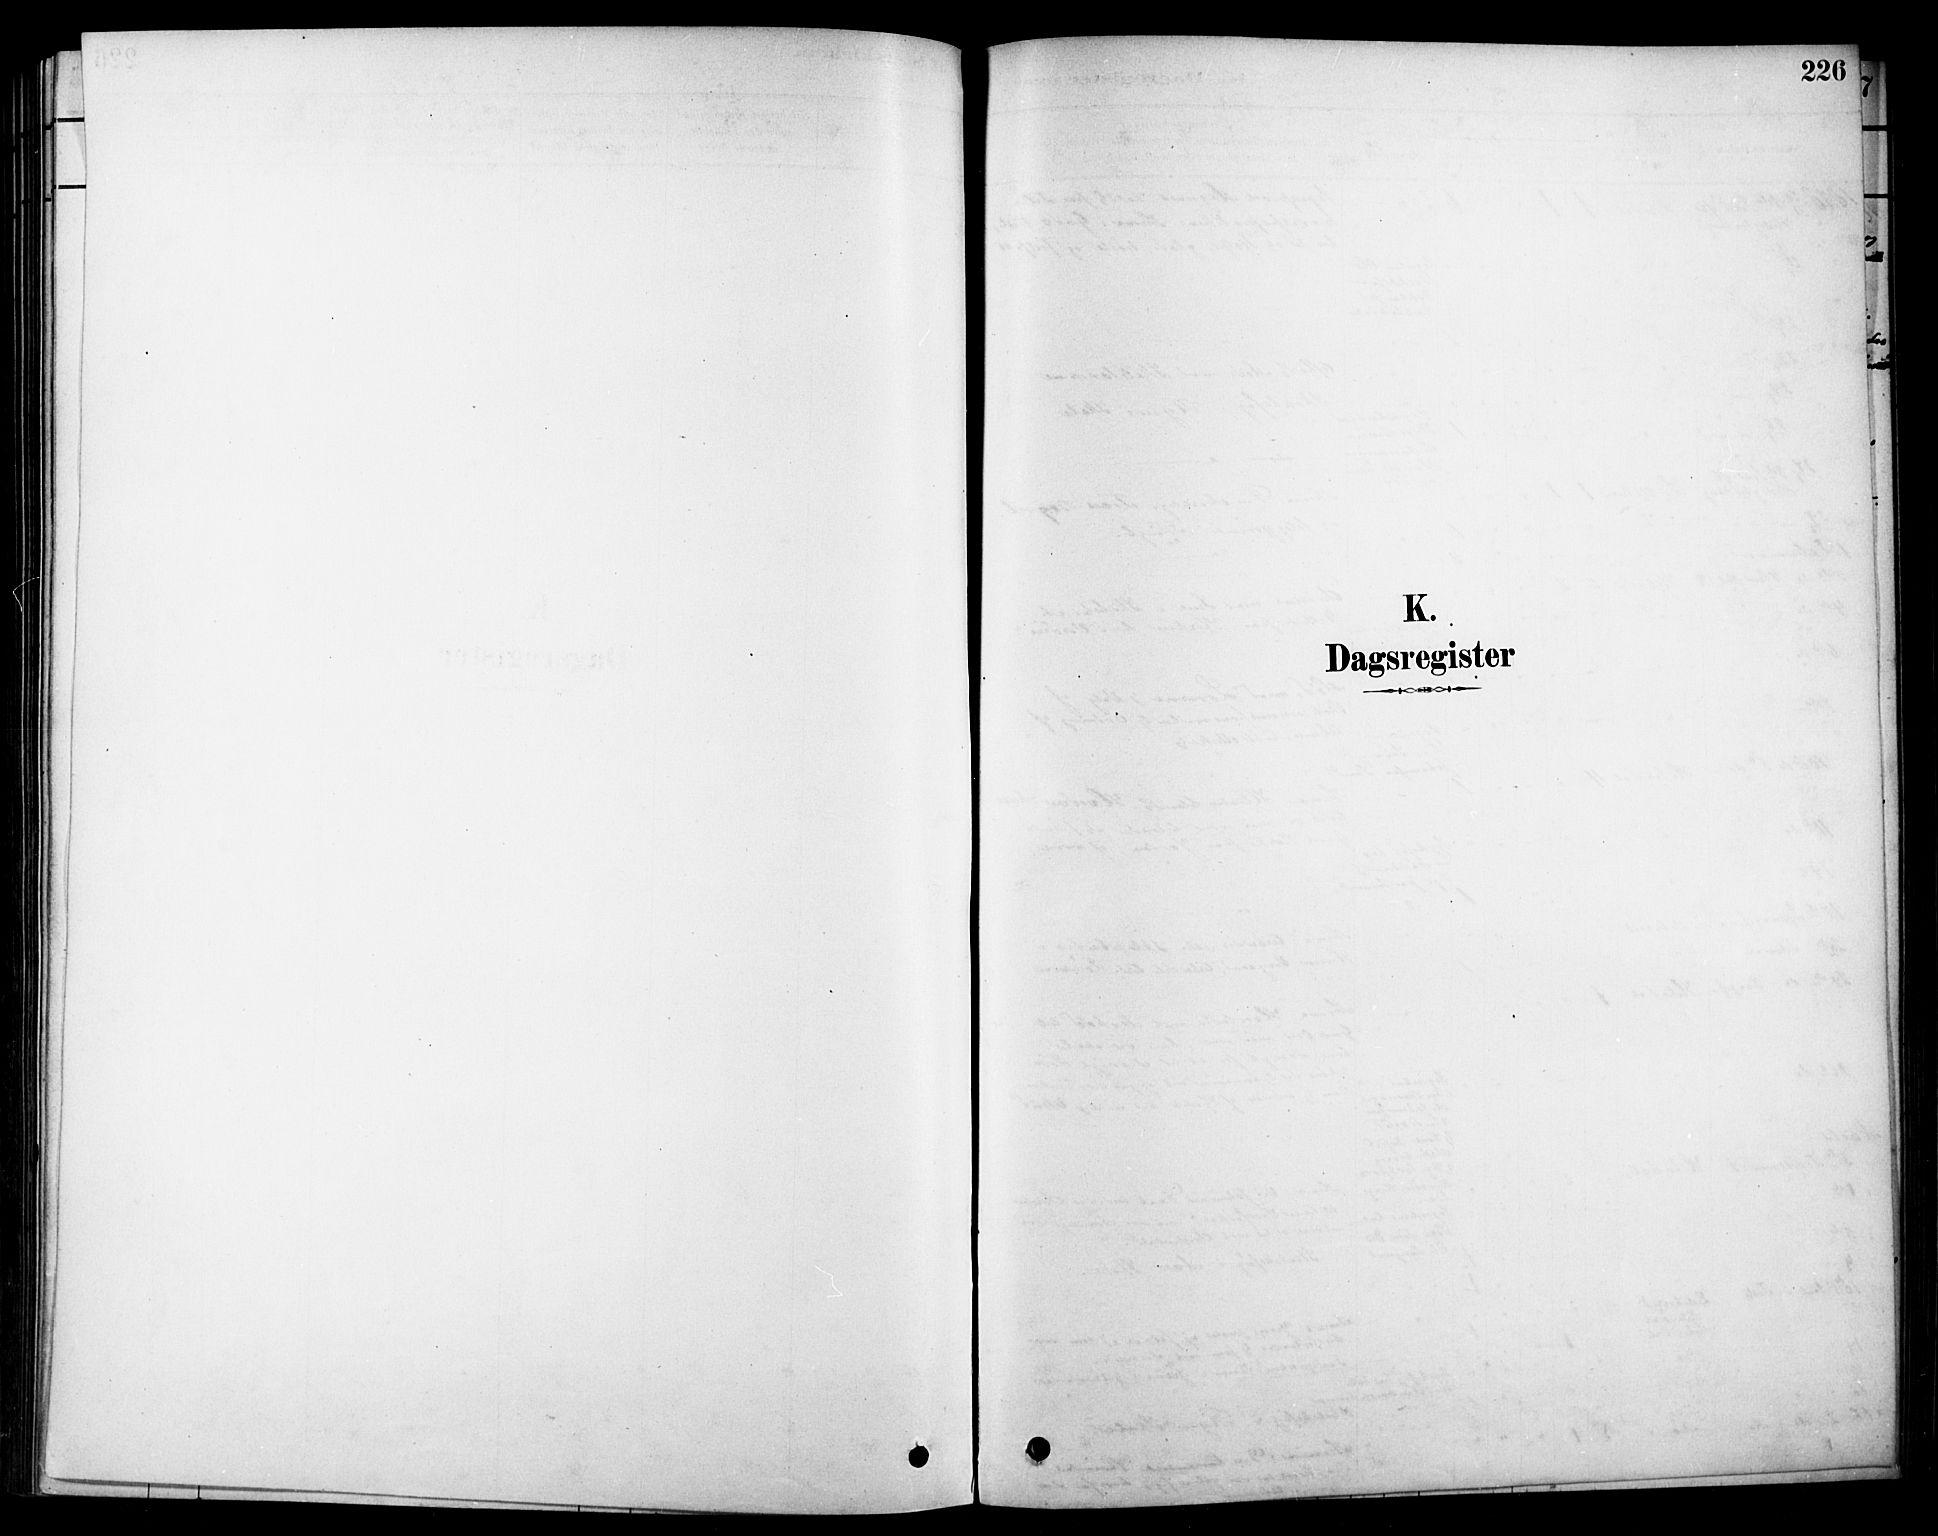 SAKO, Heddal kirkebøker, F/Fa/L0009: Parish register (official) no. I 9, 1878-1903, p. 226